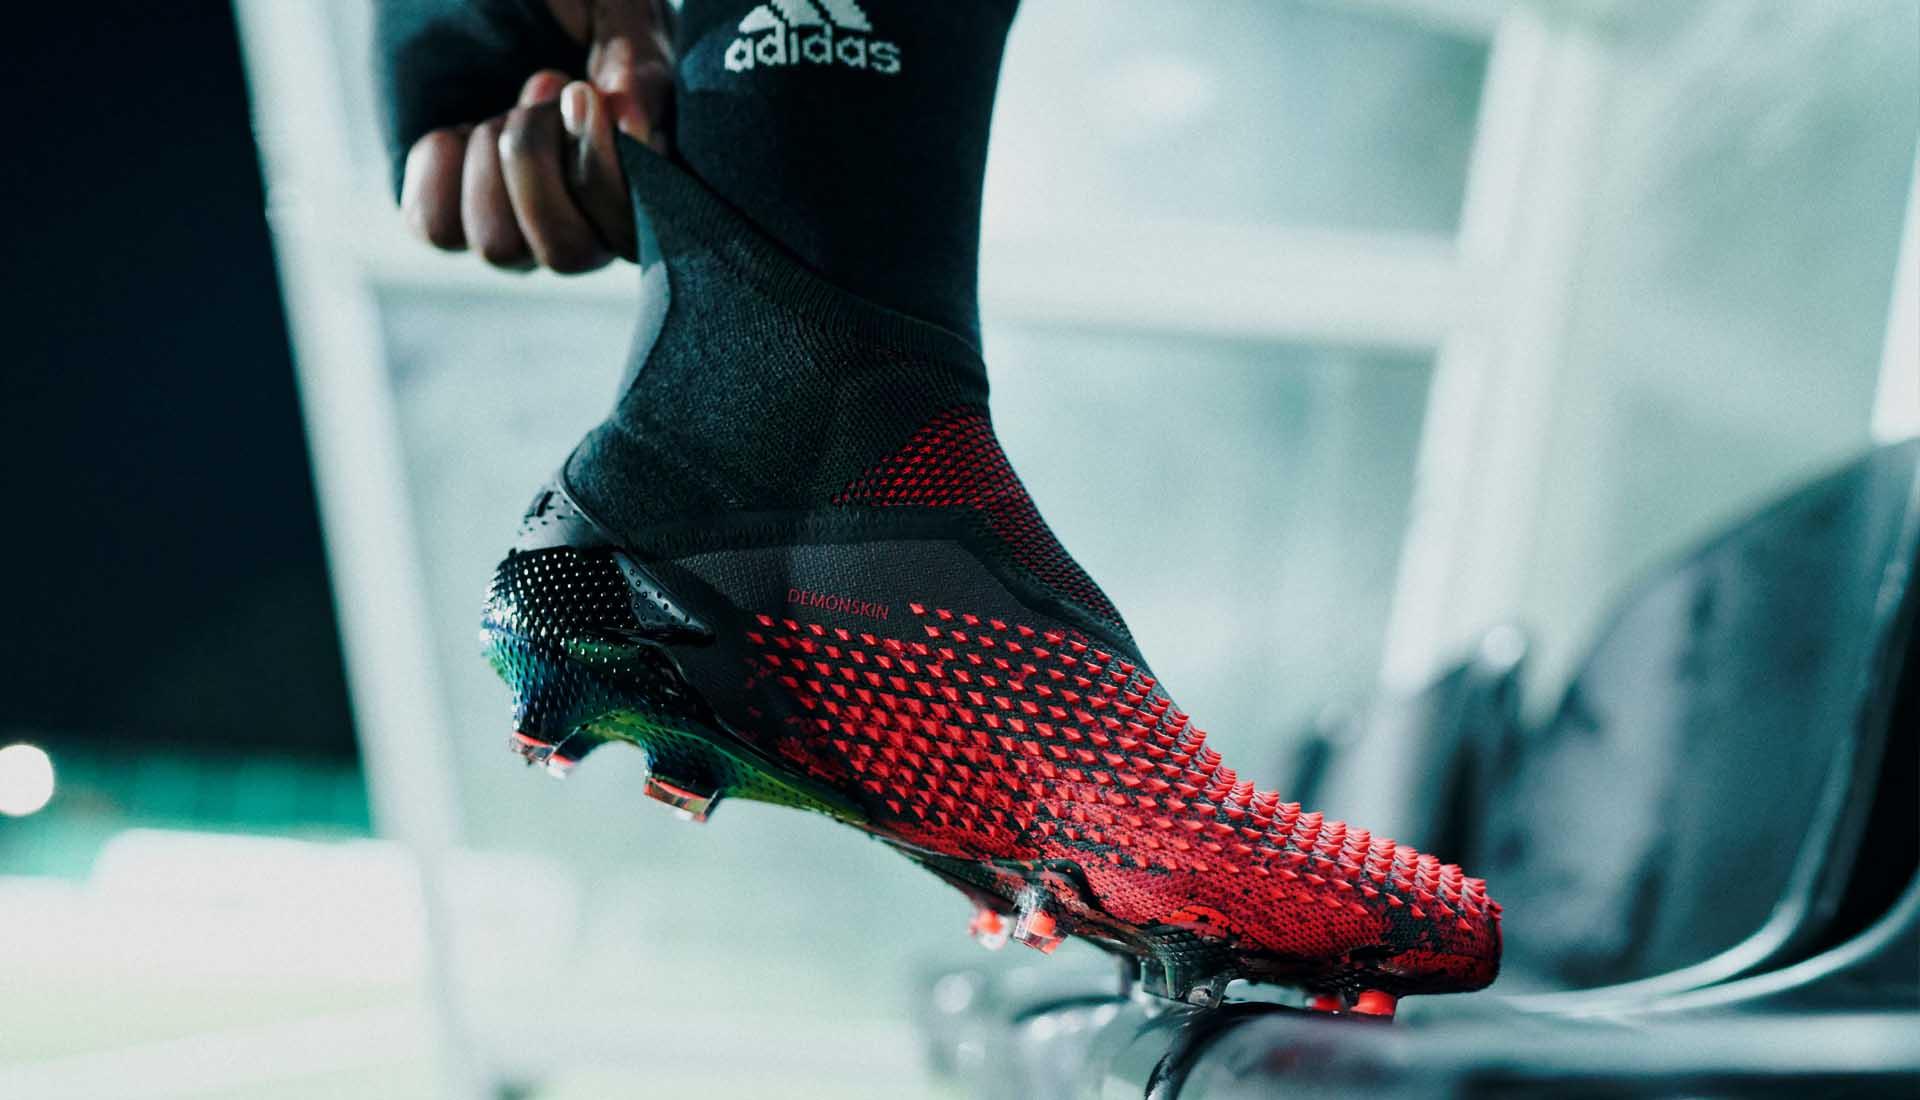 Next Gen Adidas Predator 20 Prototype Boots Leaked 3 New.